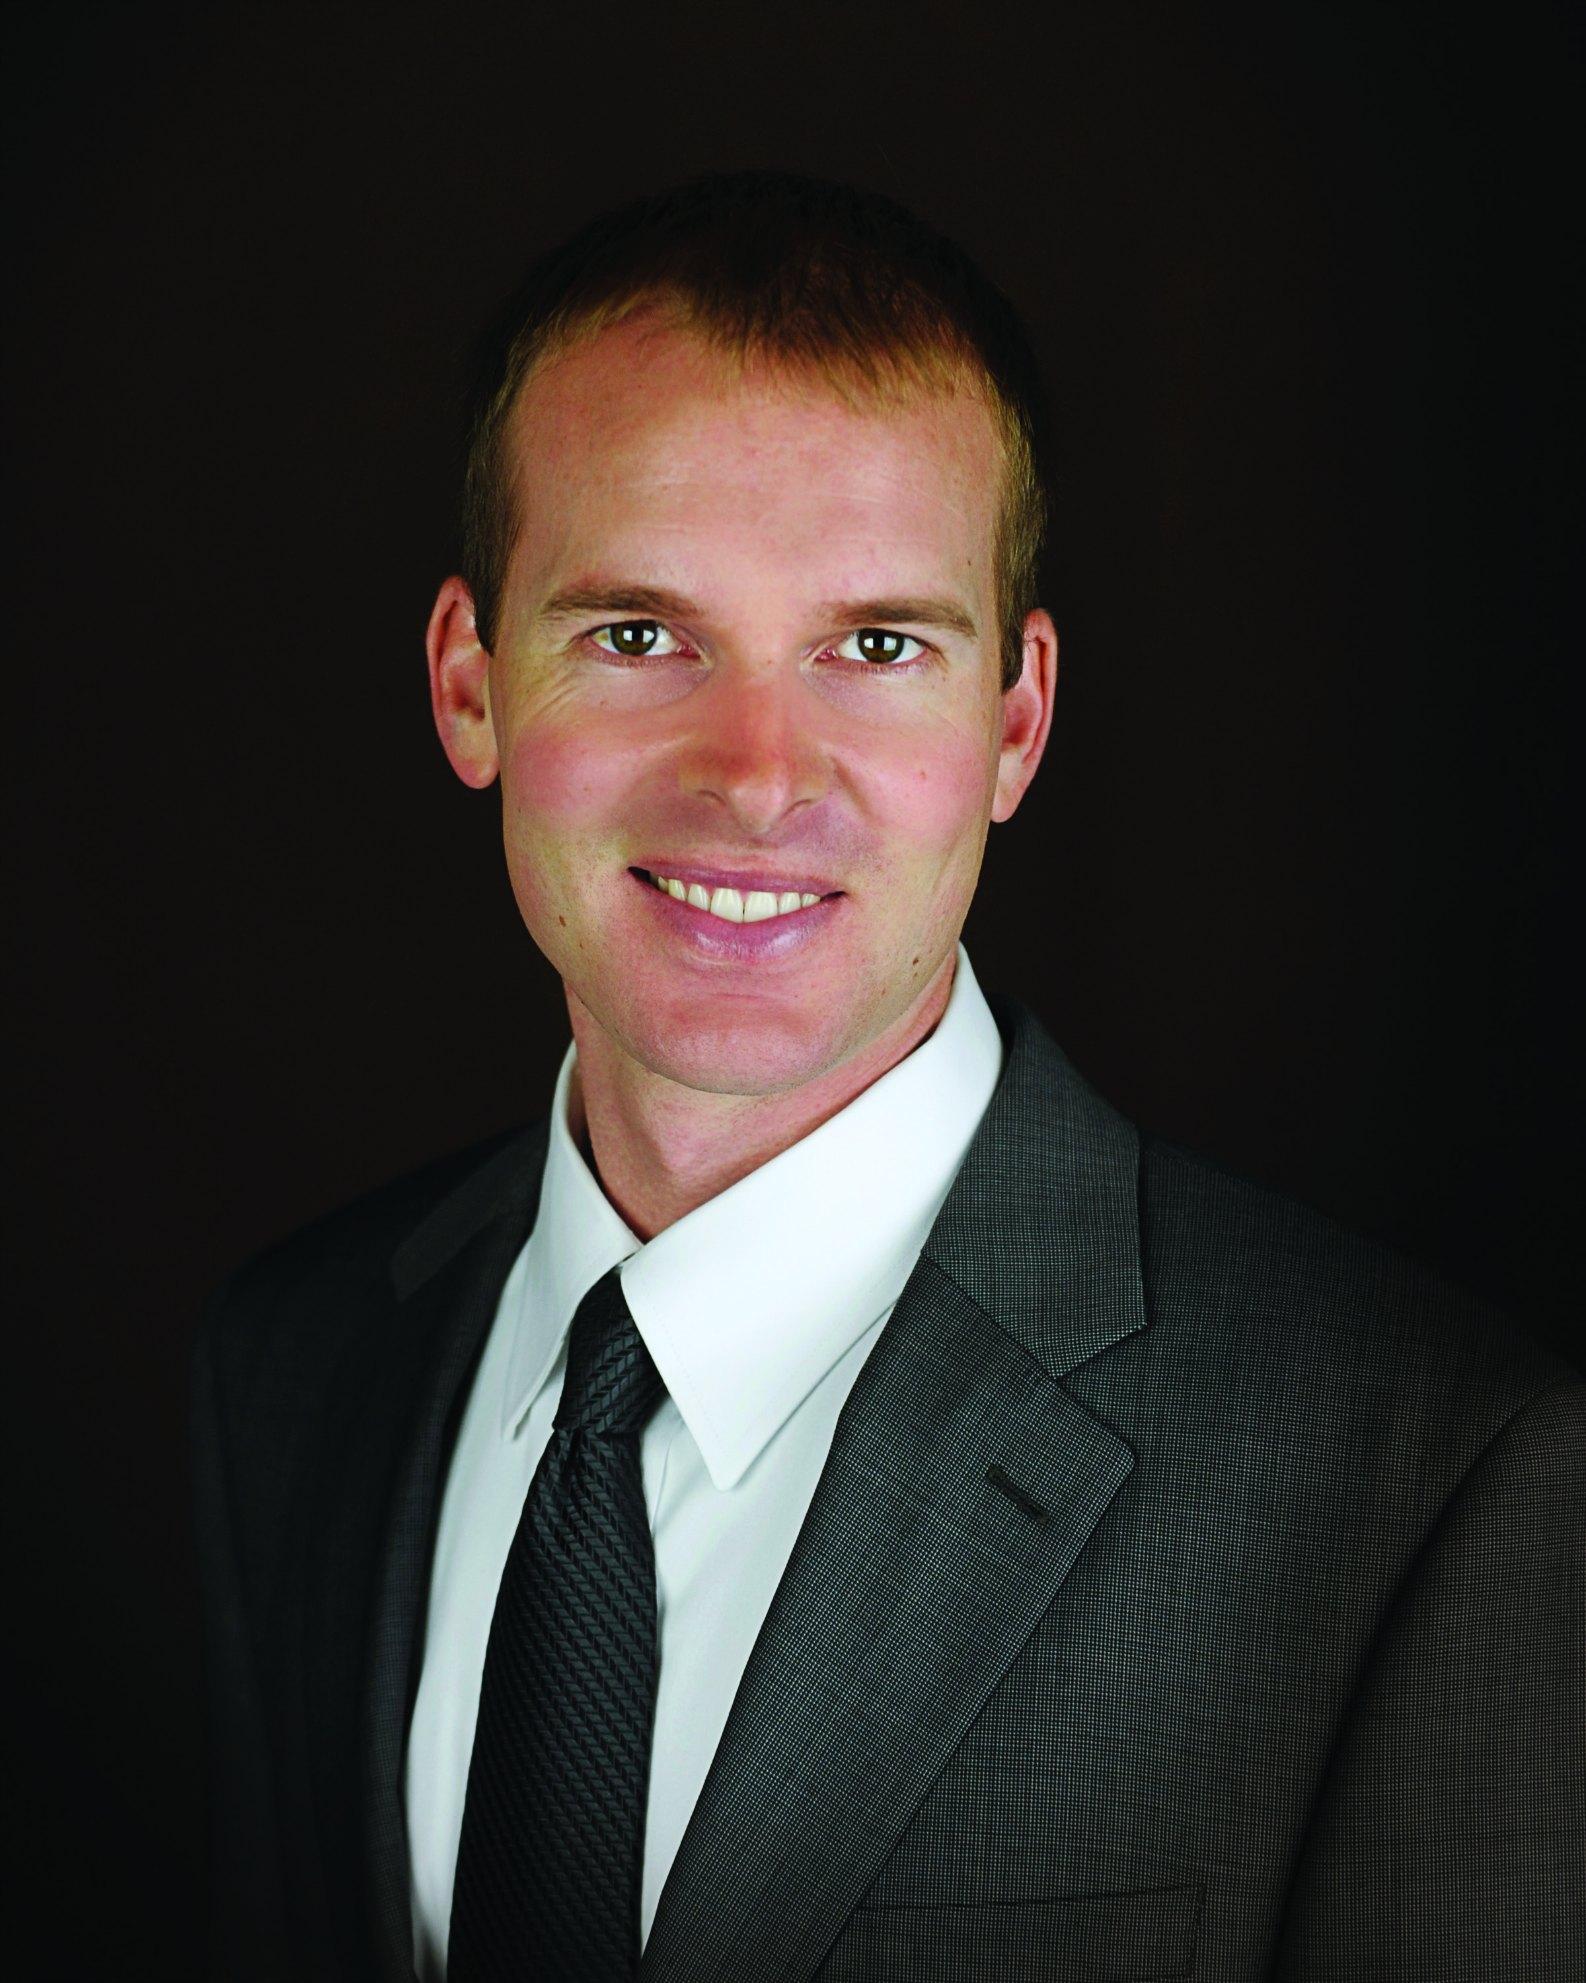 Kyle Schmidtlein